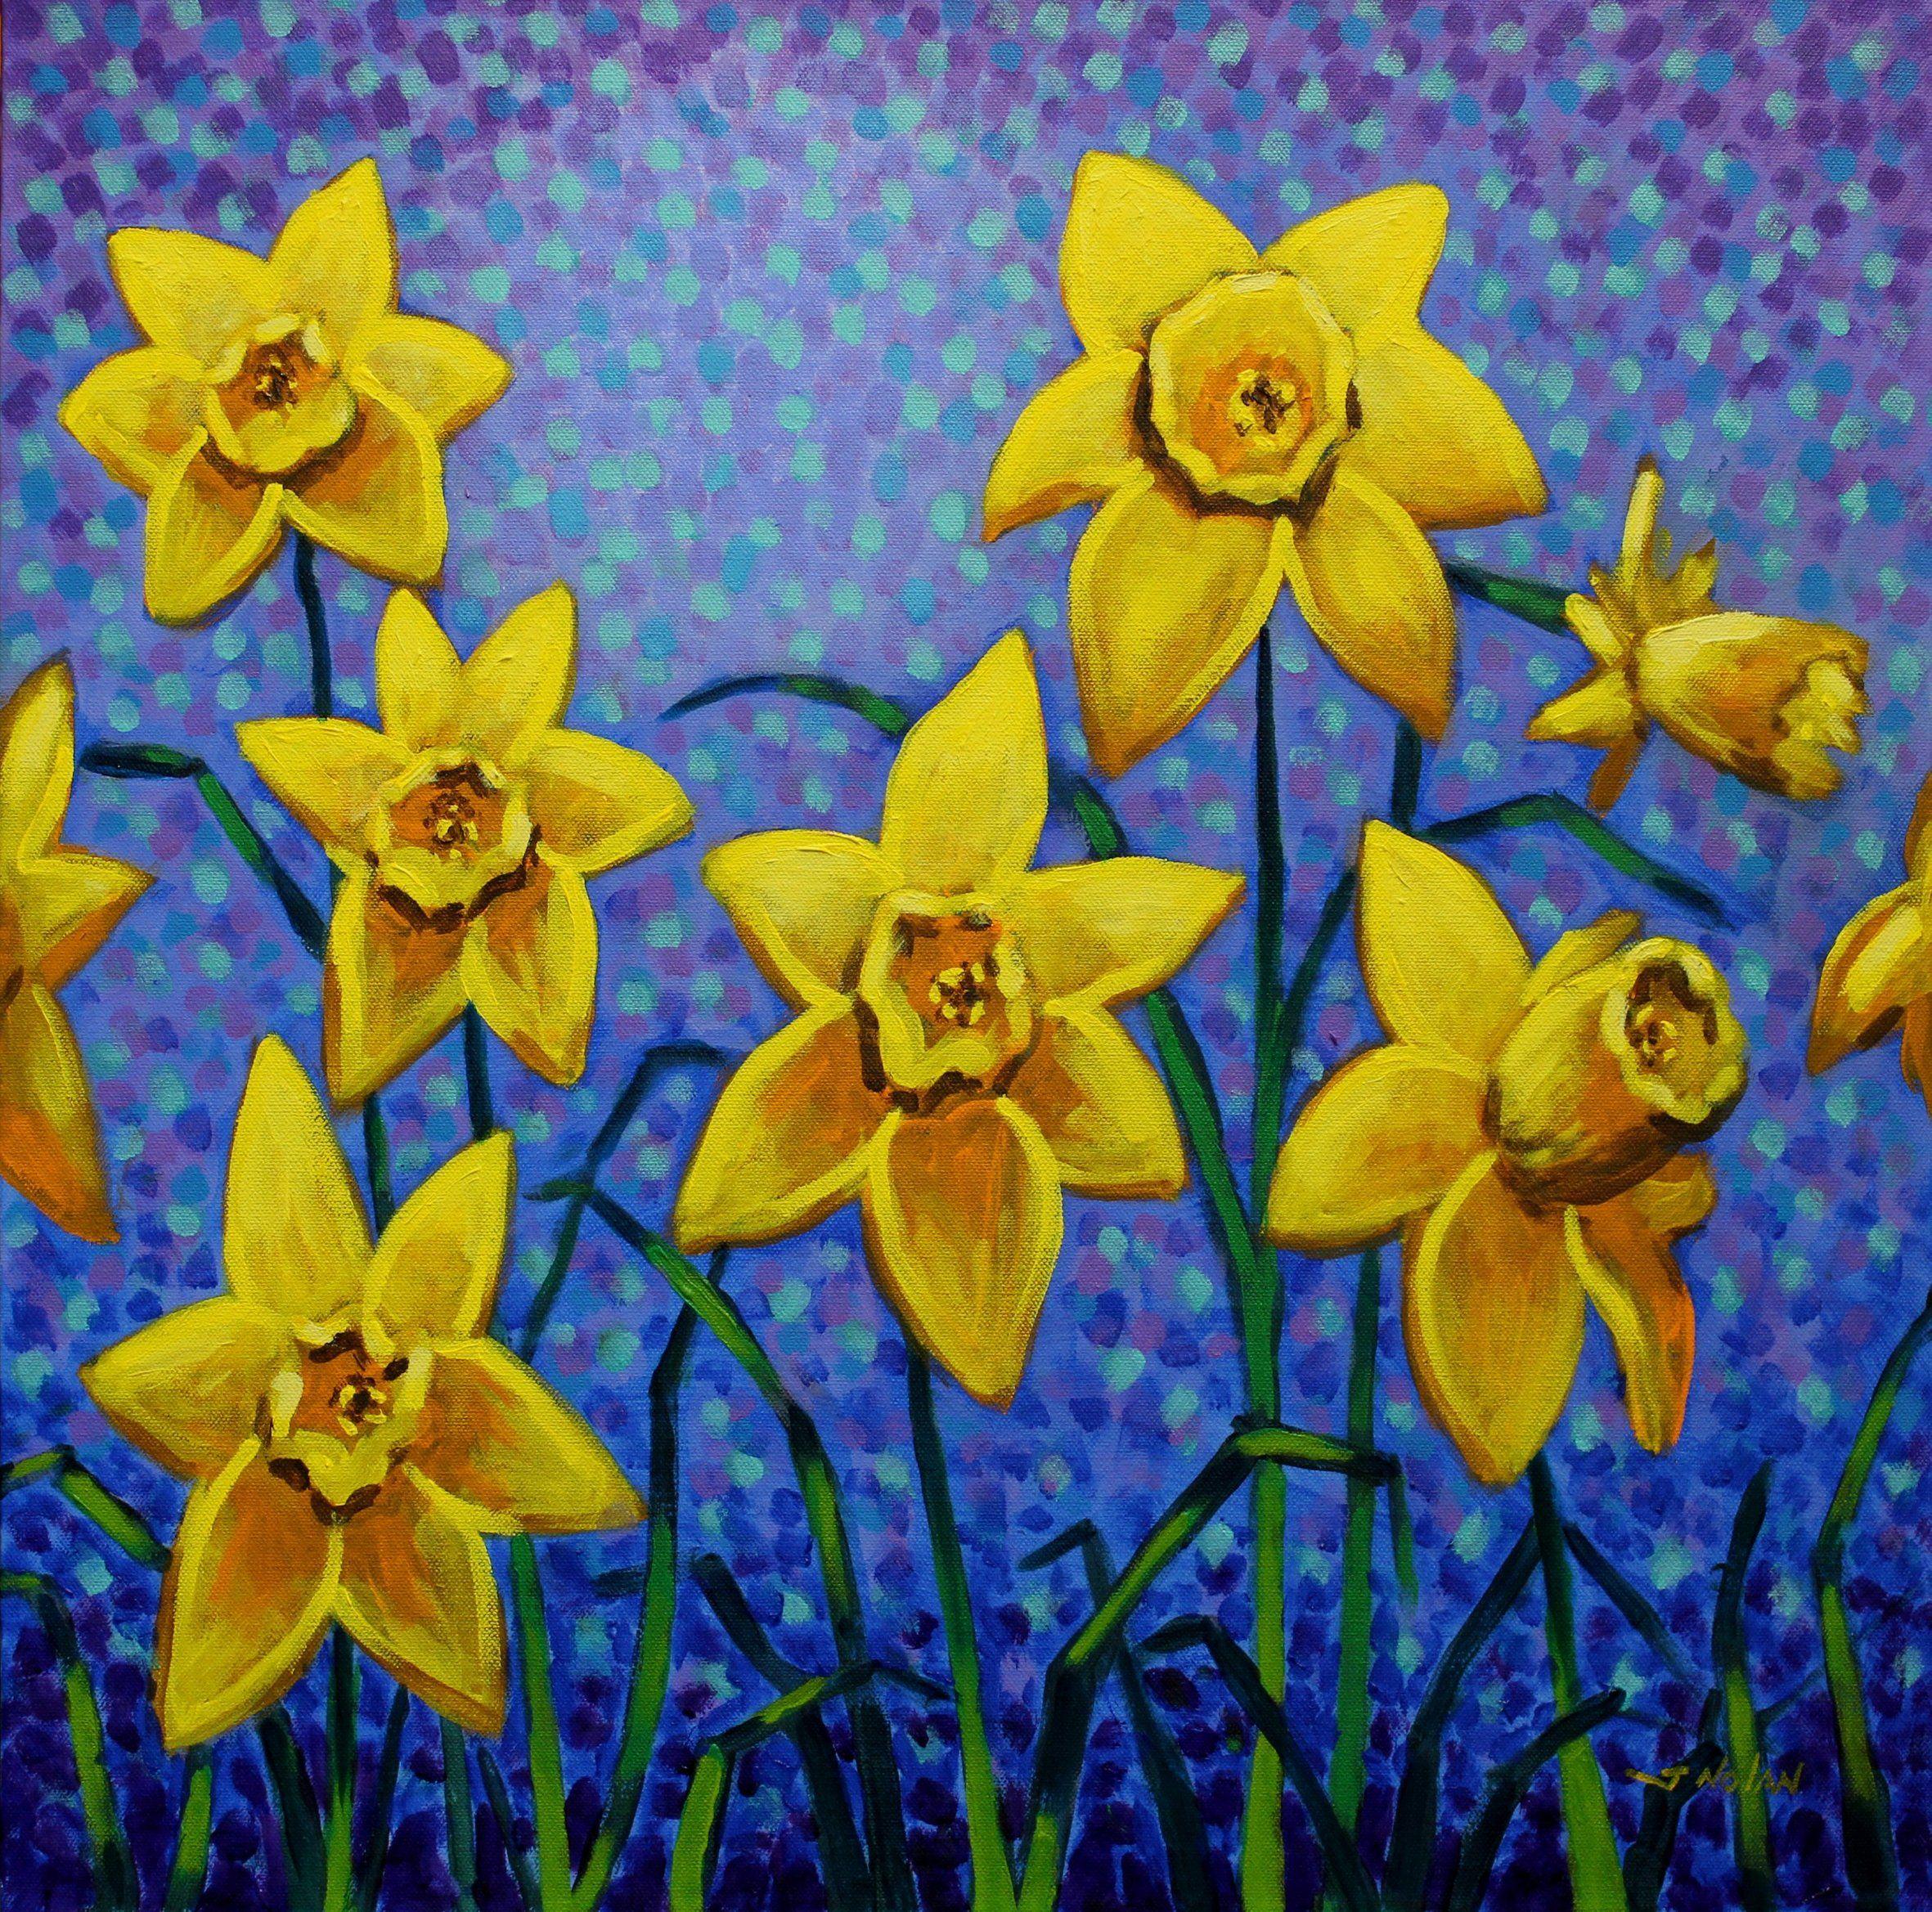 Spring Daffodil John Nolan Flower Drawing Art I Wandered Lonely A Cloud Symbol